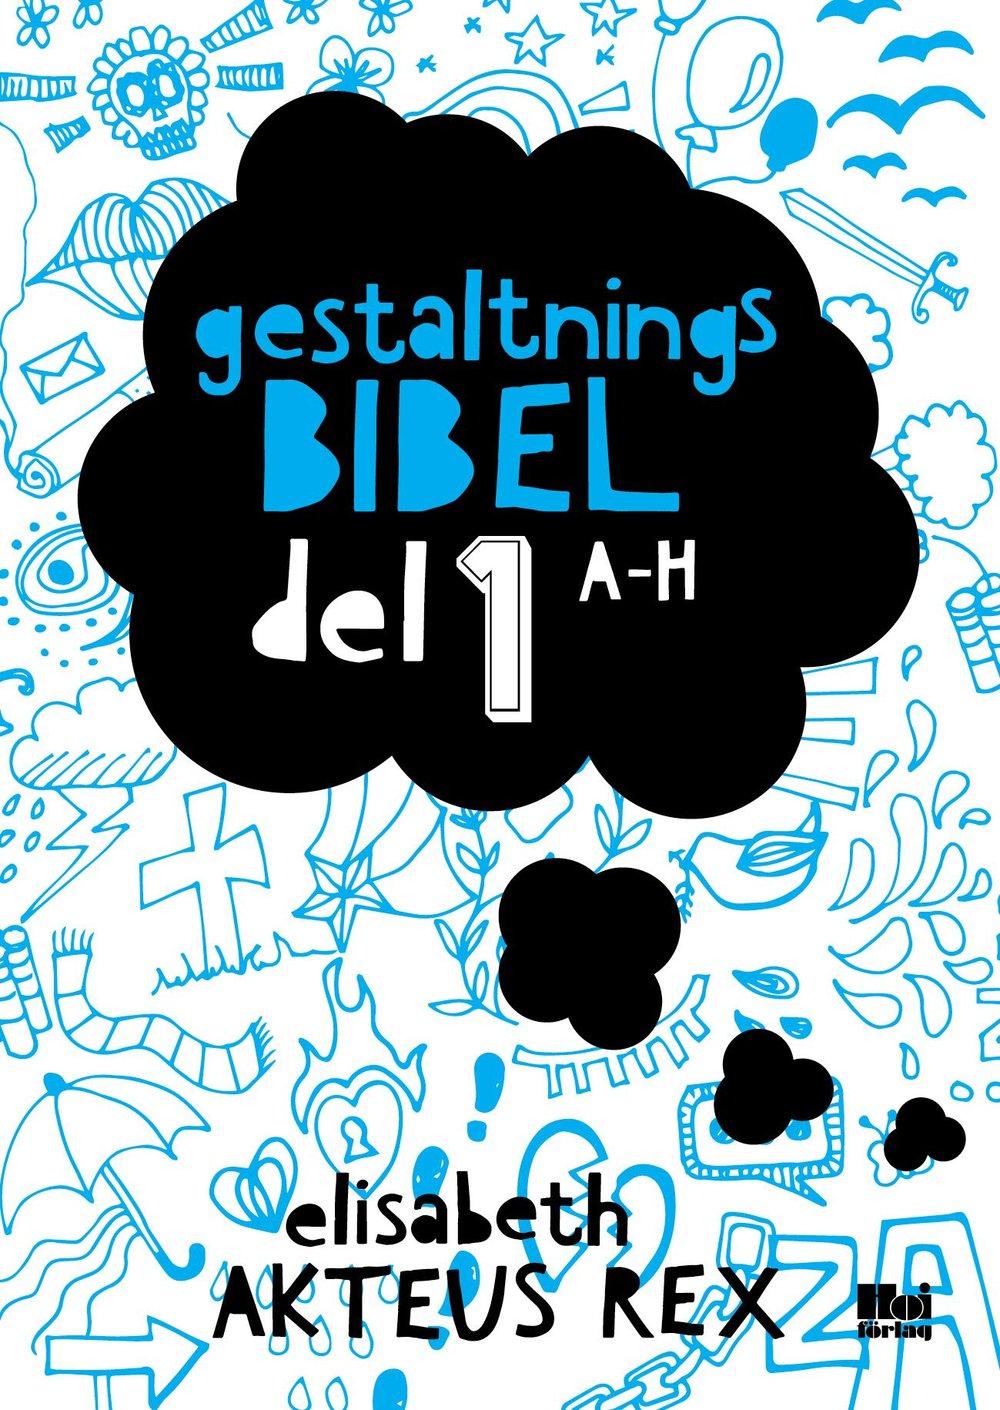 Gestaltningsbibeln del 1 a-h